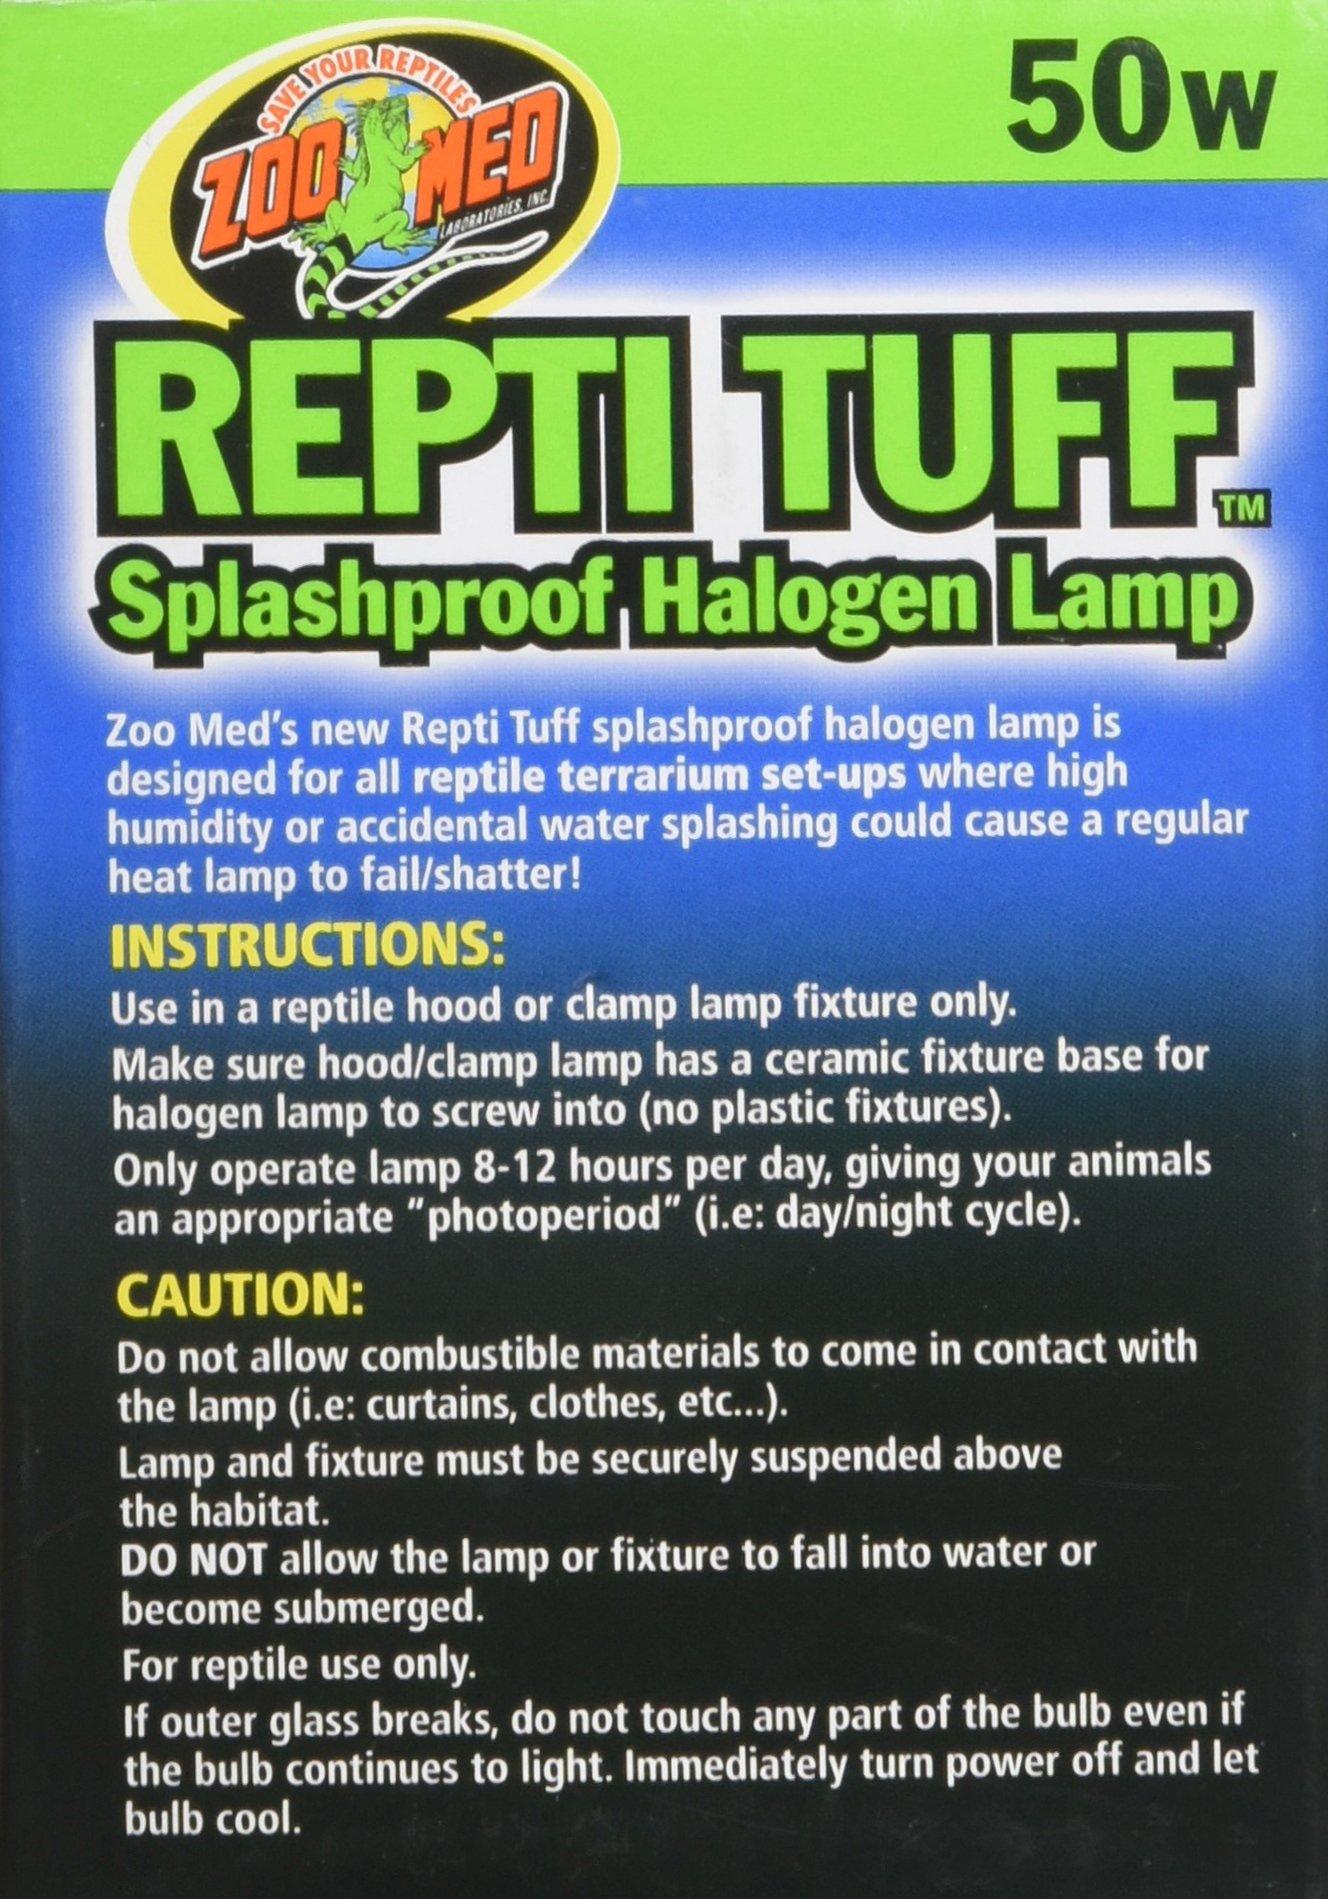 Zoo Med Repti Tuff Splashproof Halogen Lamp 50 Watts by Zoo Med (Image #1)